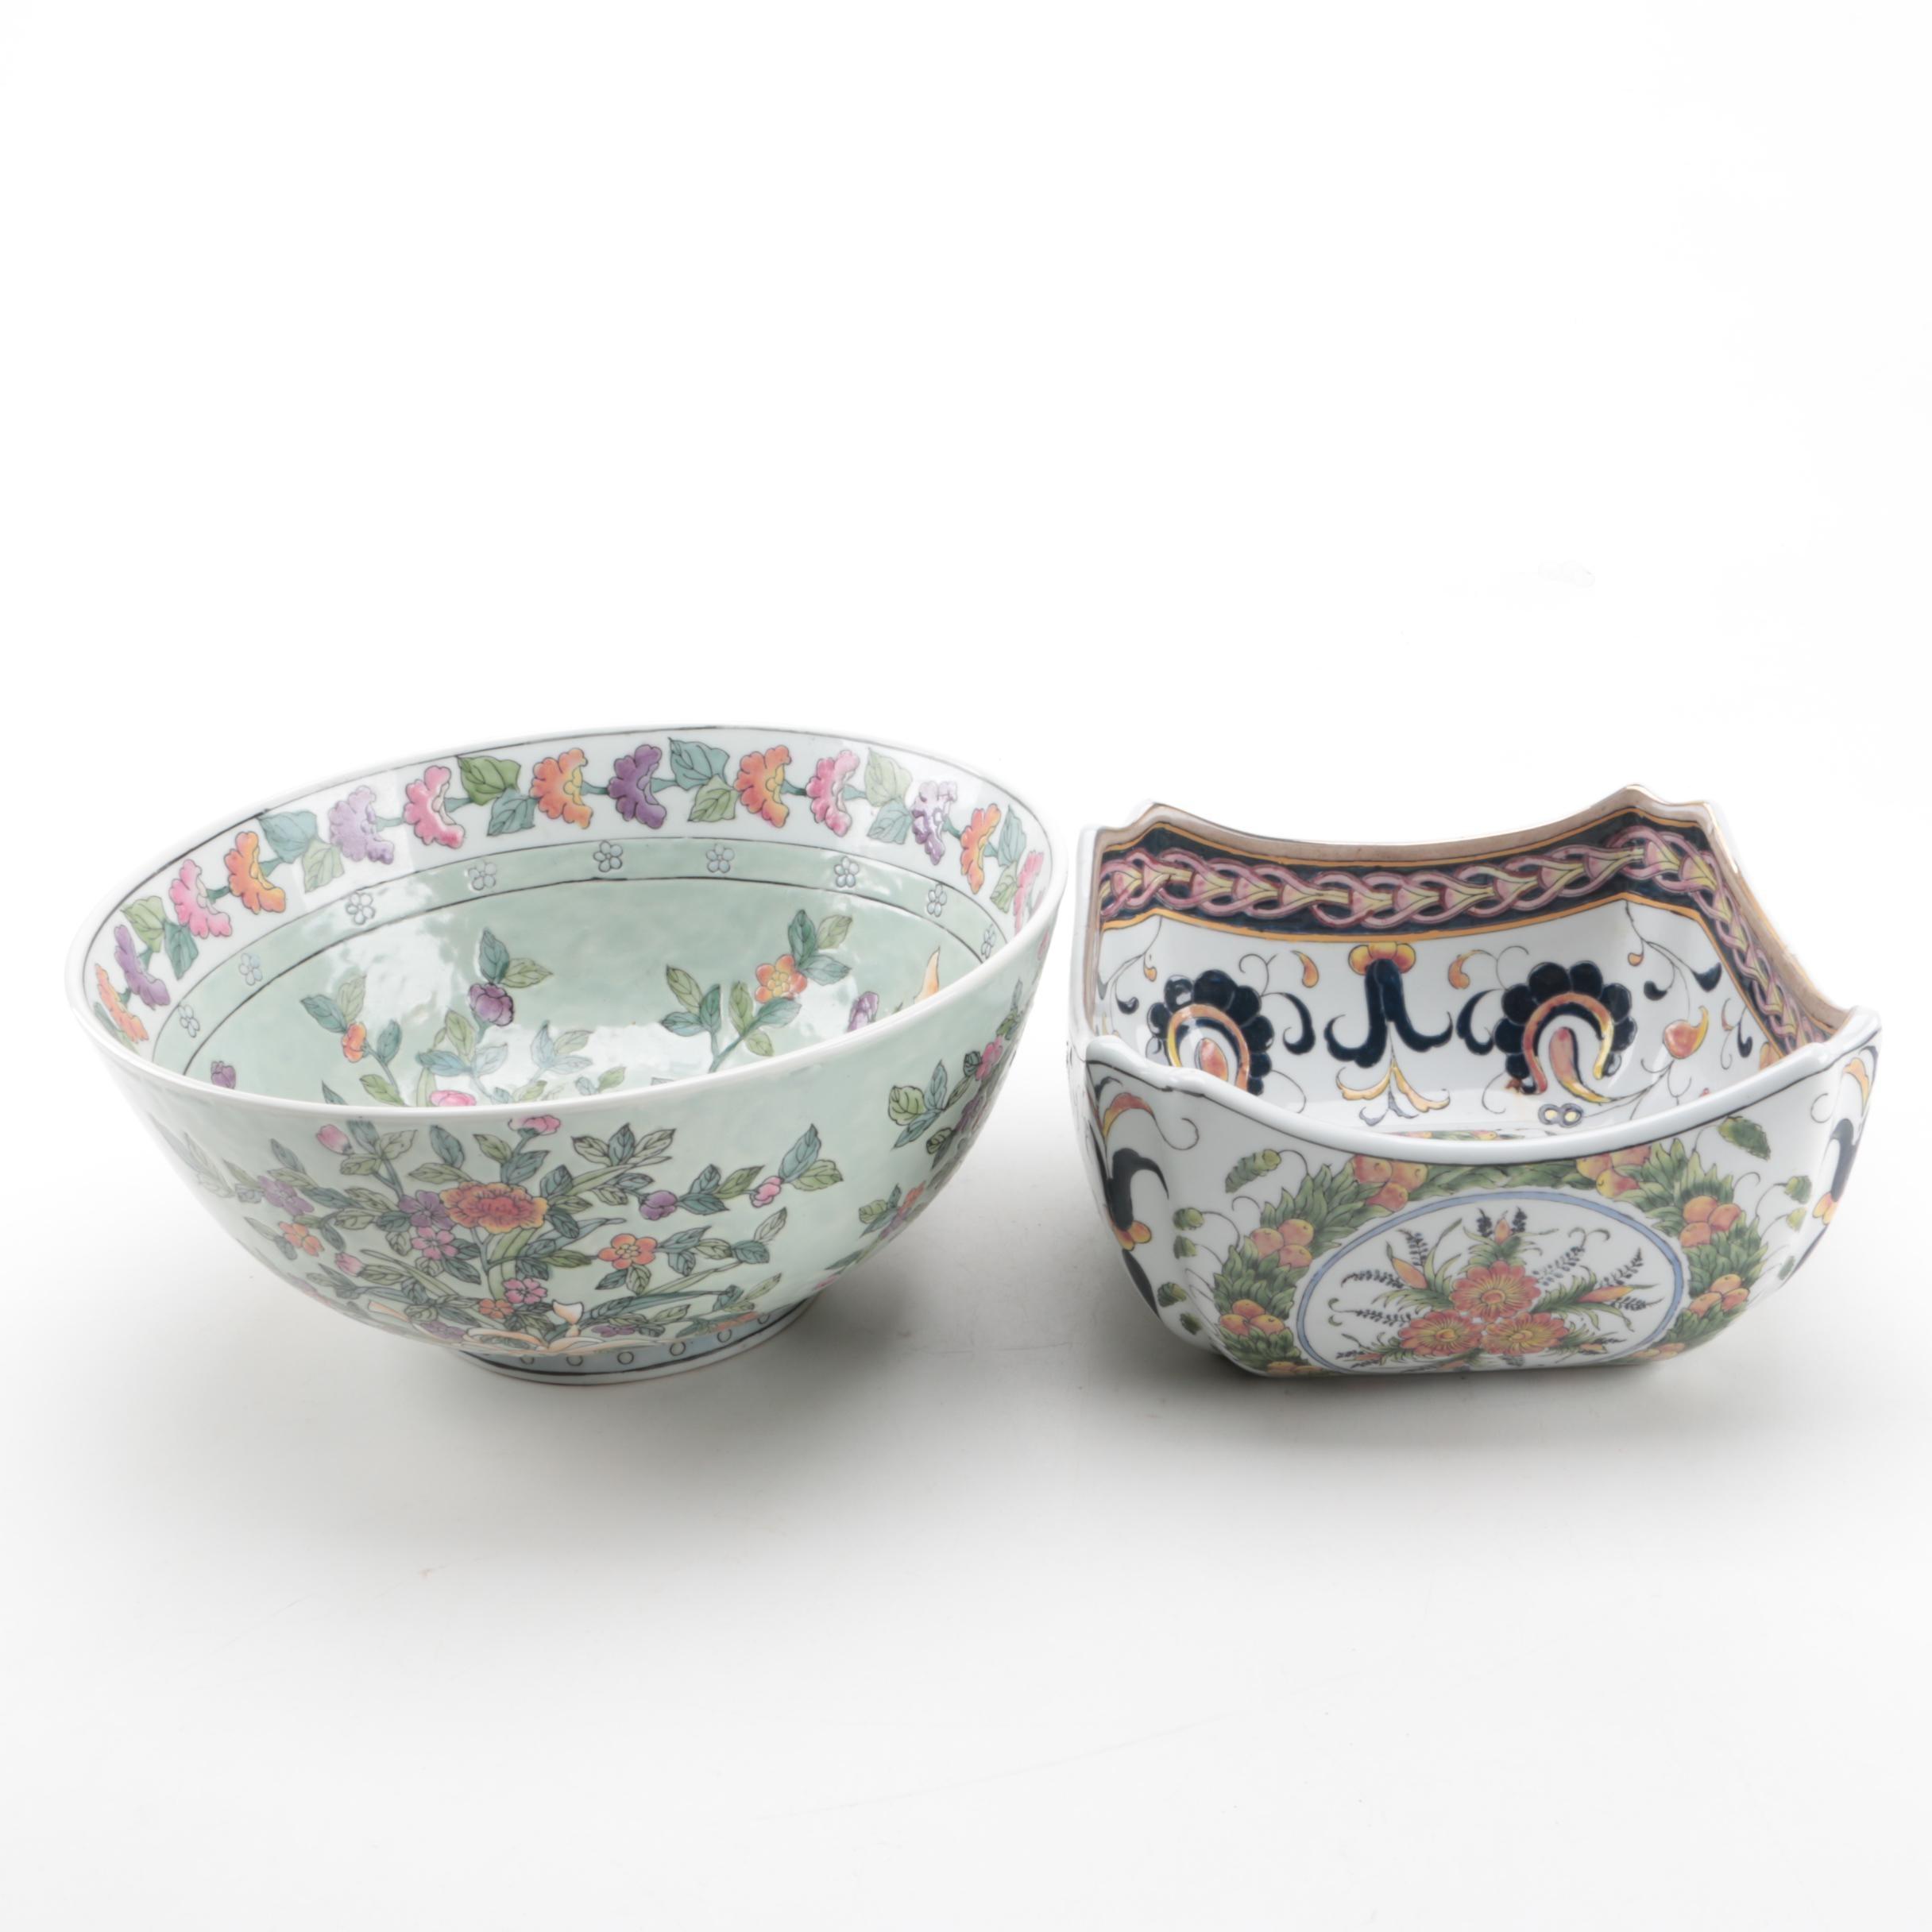 Decorative Ceramic Bowls